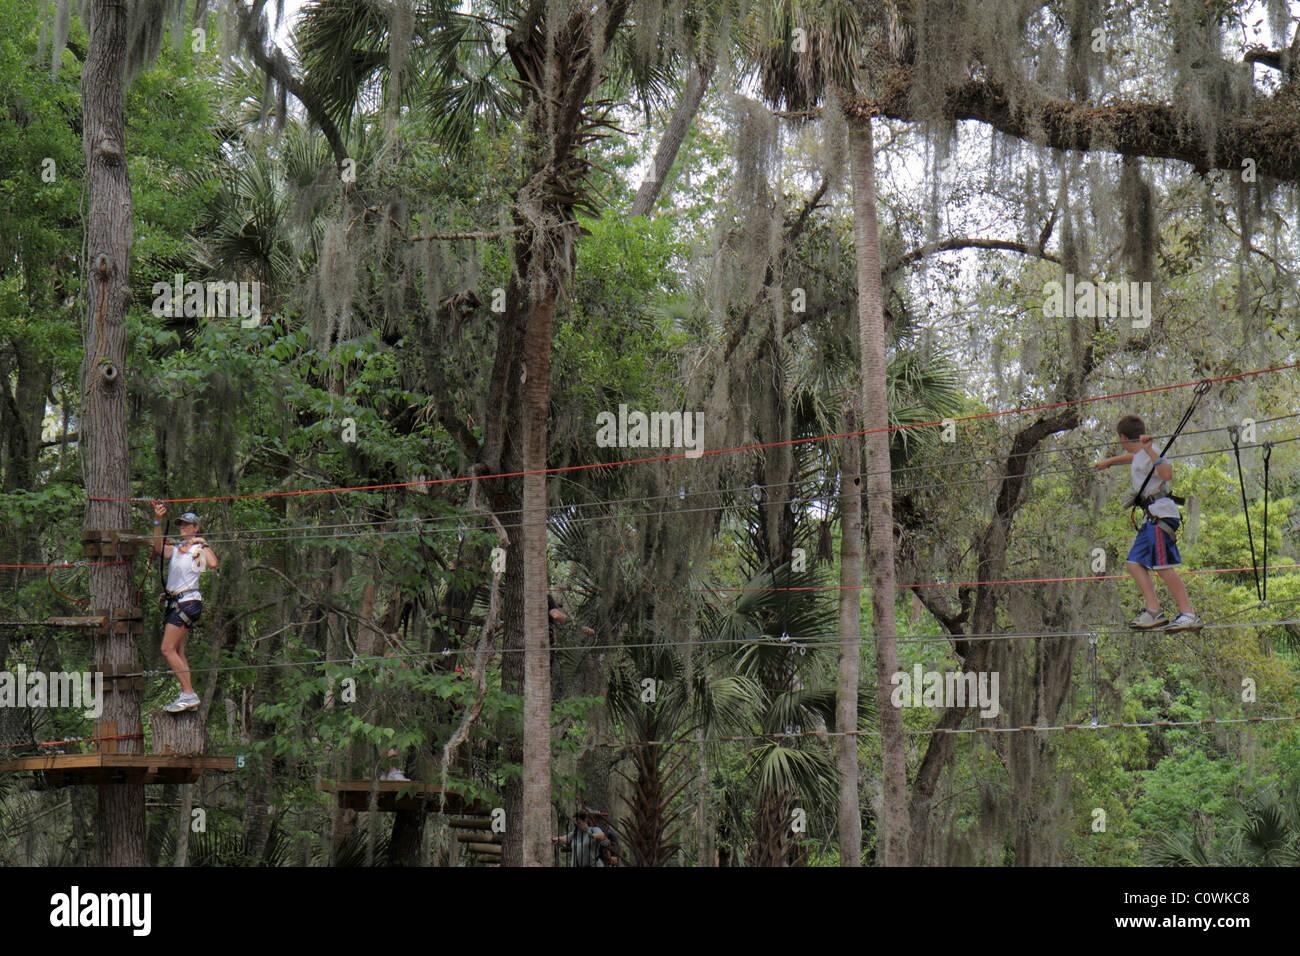 Florida Orlando Sanford Central Florida Zoo And Botanical Gardens Stock Photo Royalty Free